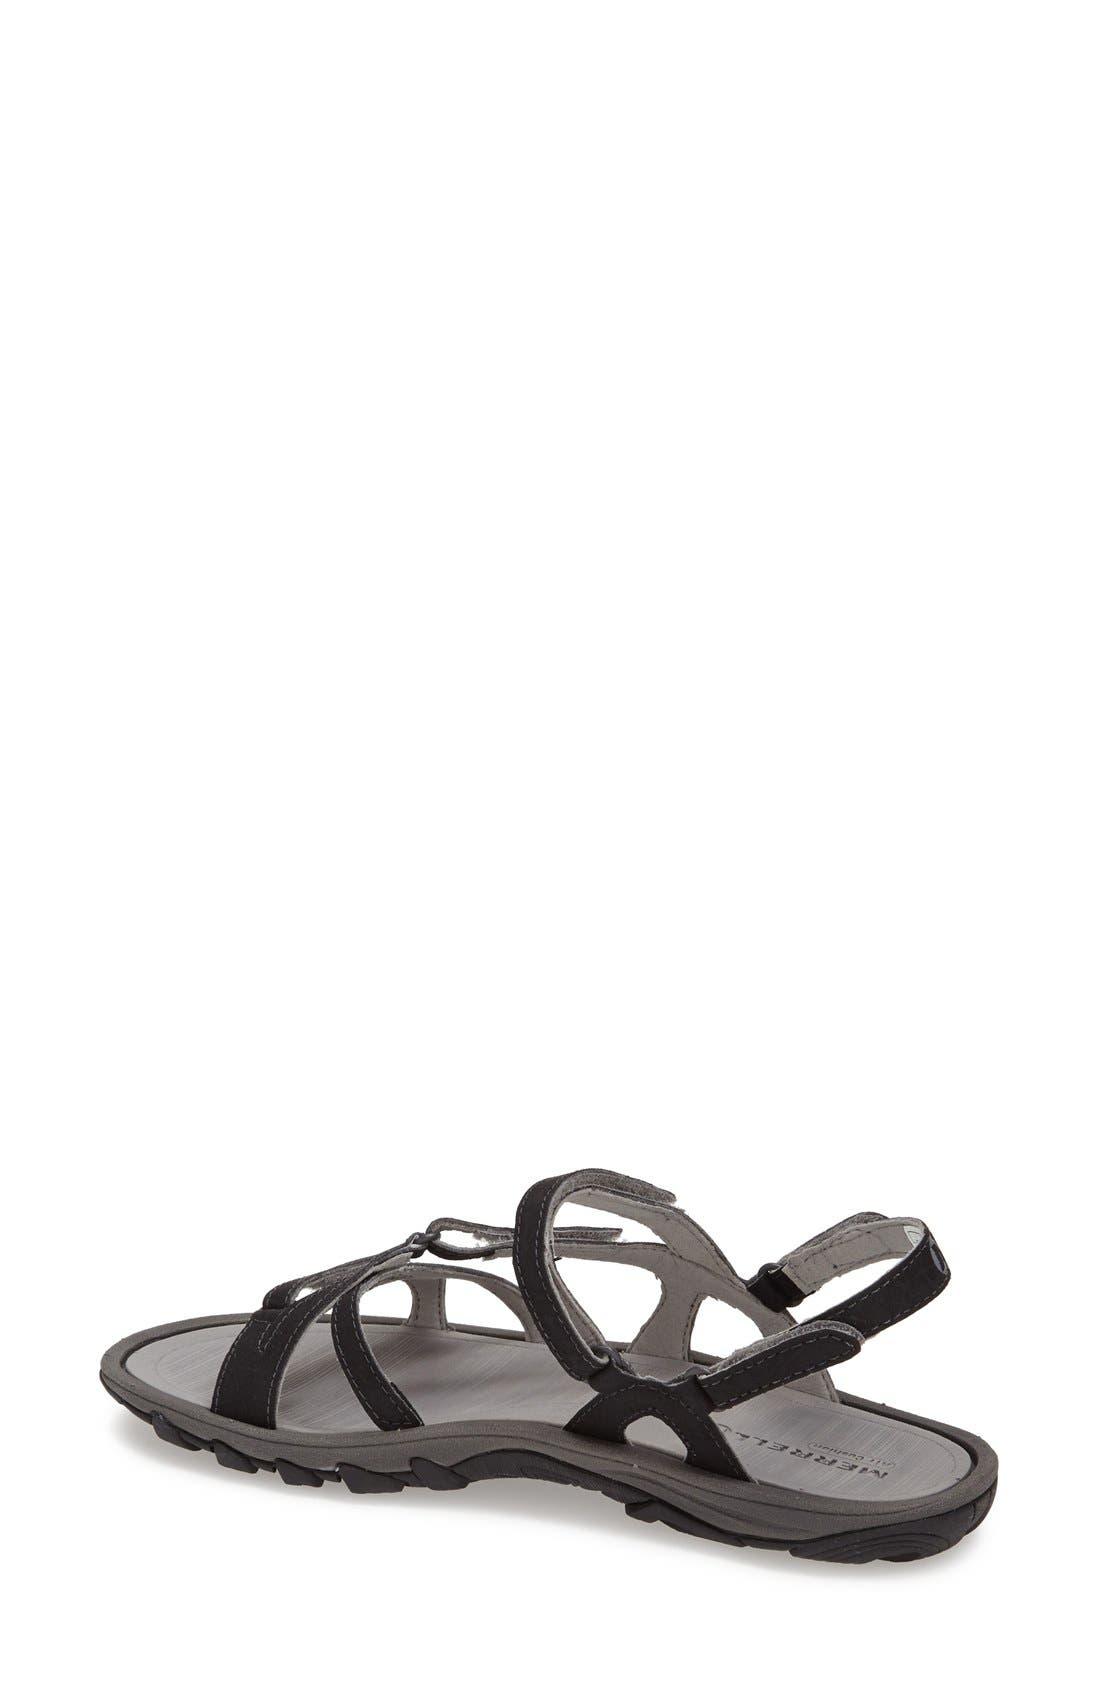 'Enoki' Water-Resistant Sandal,                             Alternate thumbnail 4, color,                             001